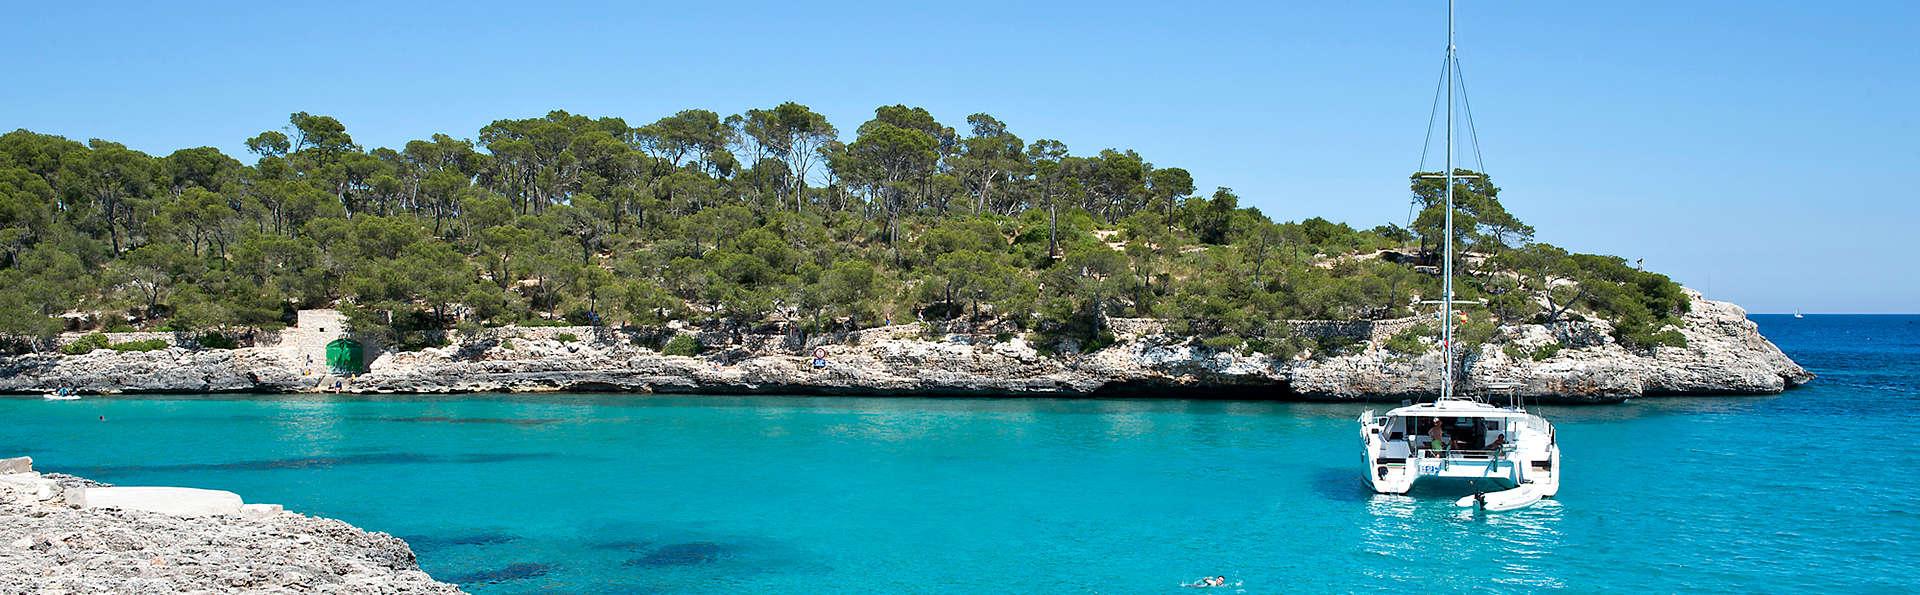 Aparthotel Pierre & Vacances Mallorca Cecilia - EDIT_N2_Cala-S_amarador2.jpg